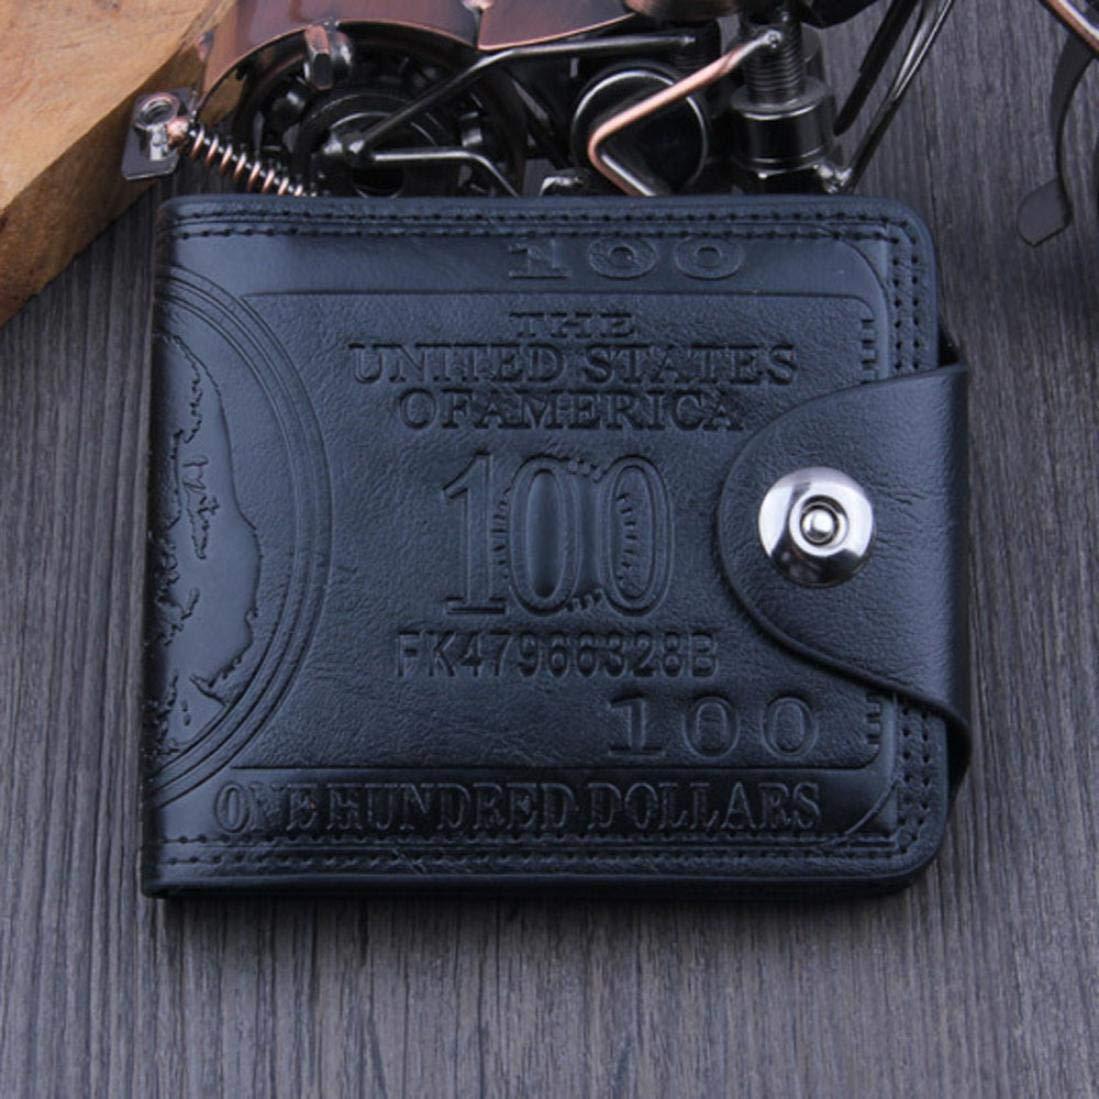 fbf941fc9 Hombre BaZhaHei-Cartera Carteras Hombre Billetera de dó lar Estadounidense Billetera  Billetera Billetera Cuero marró n ...